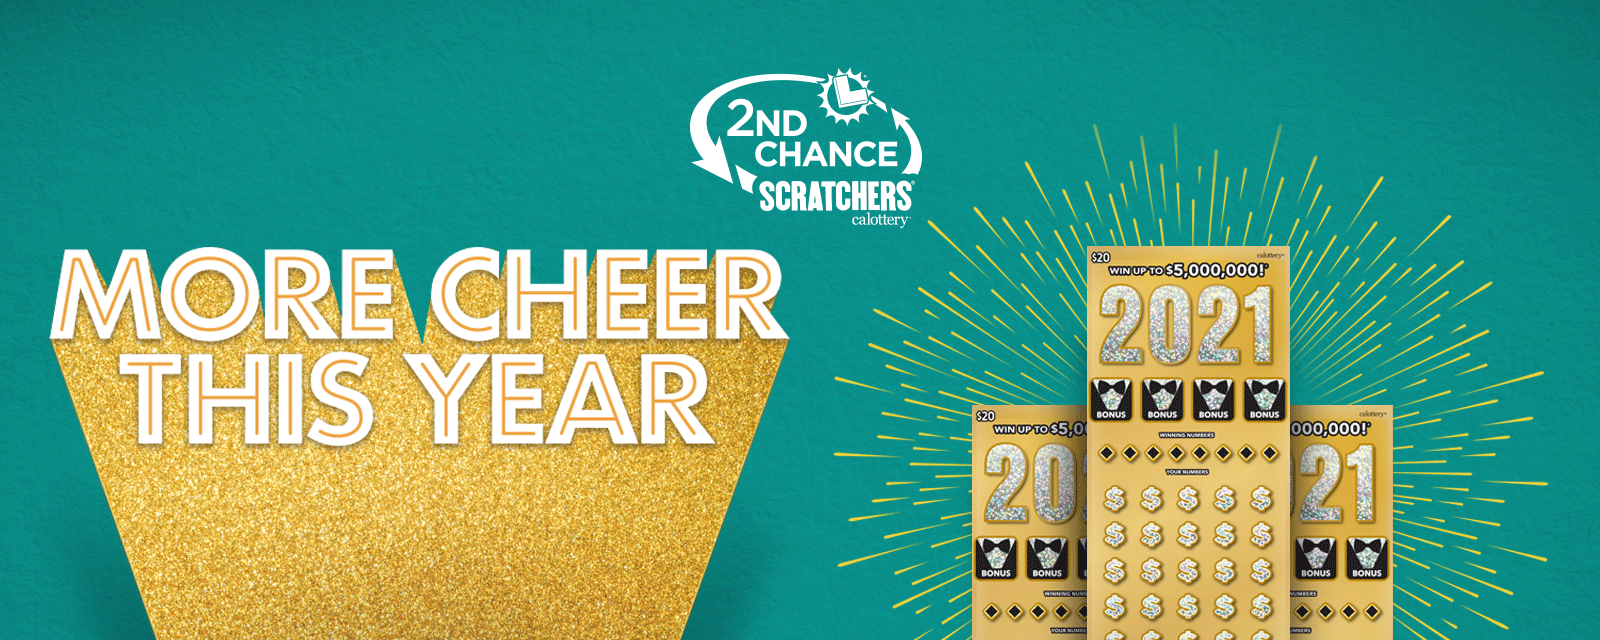 2nd Chance Scratchers logo on green background